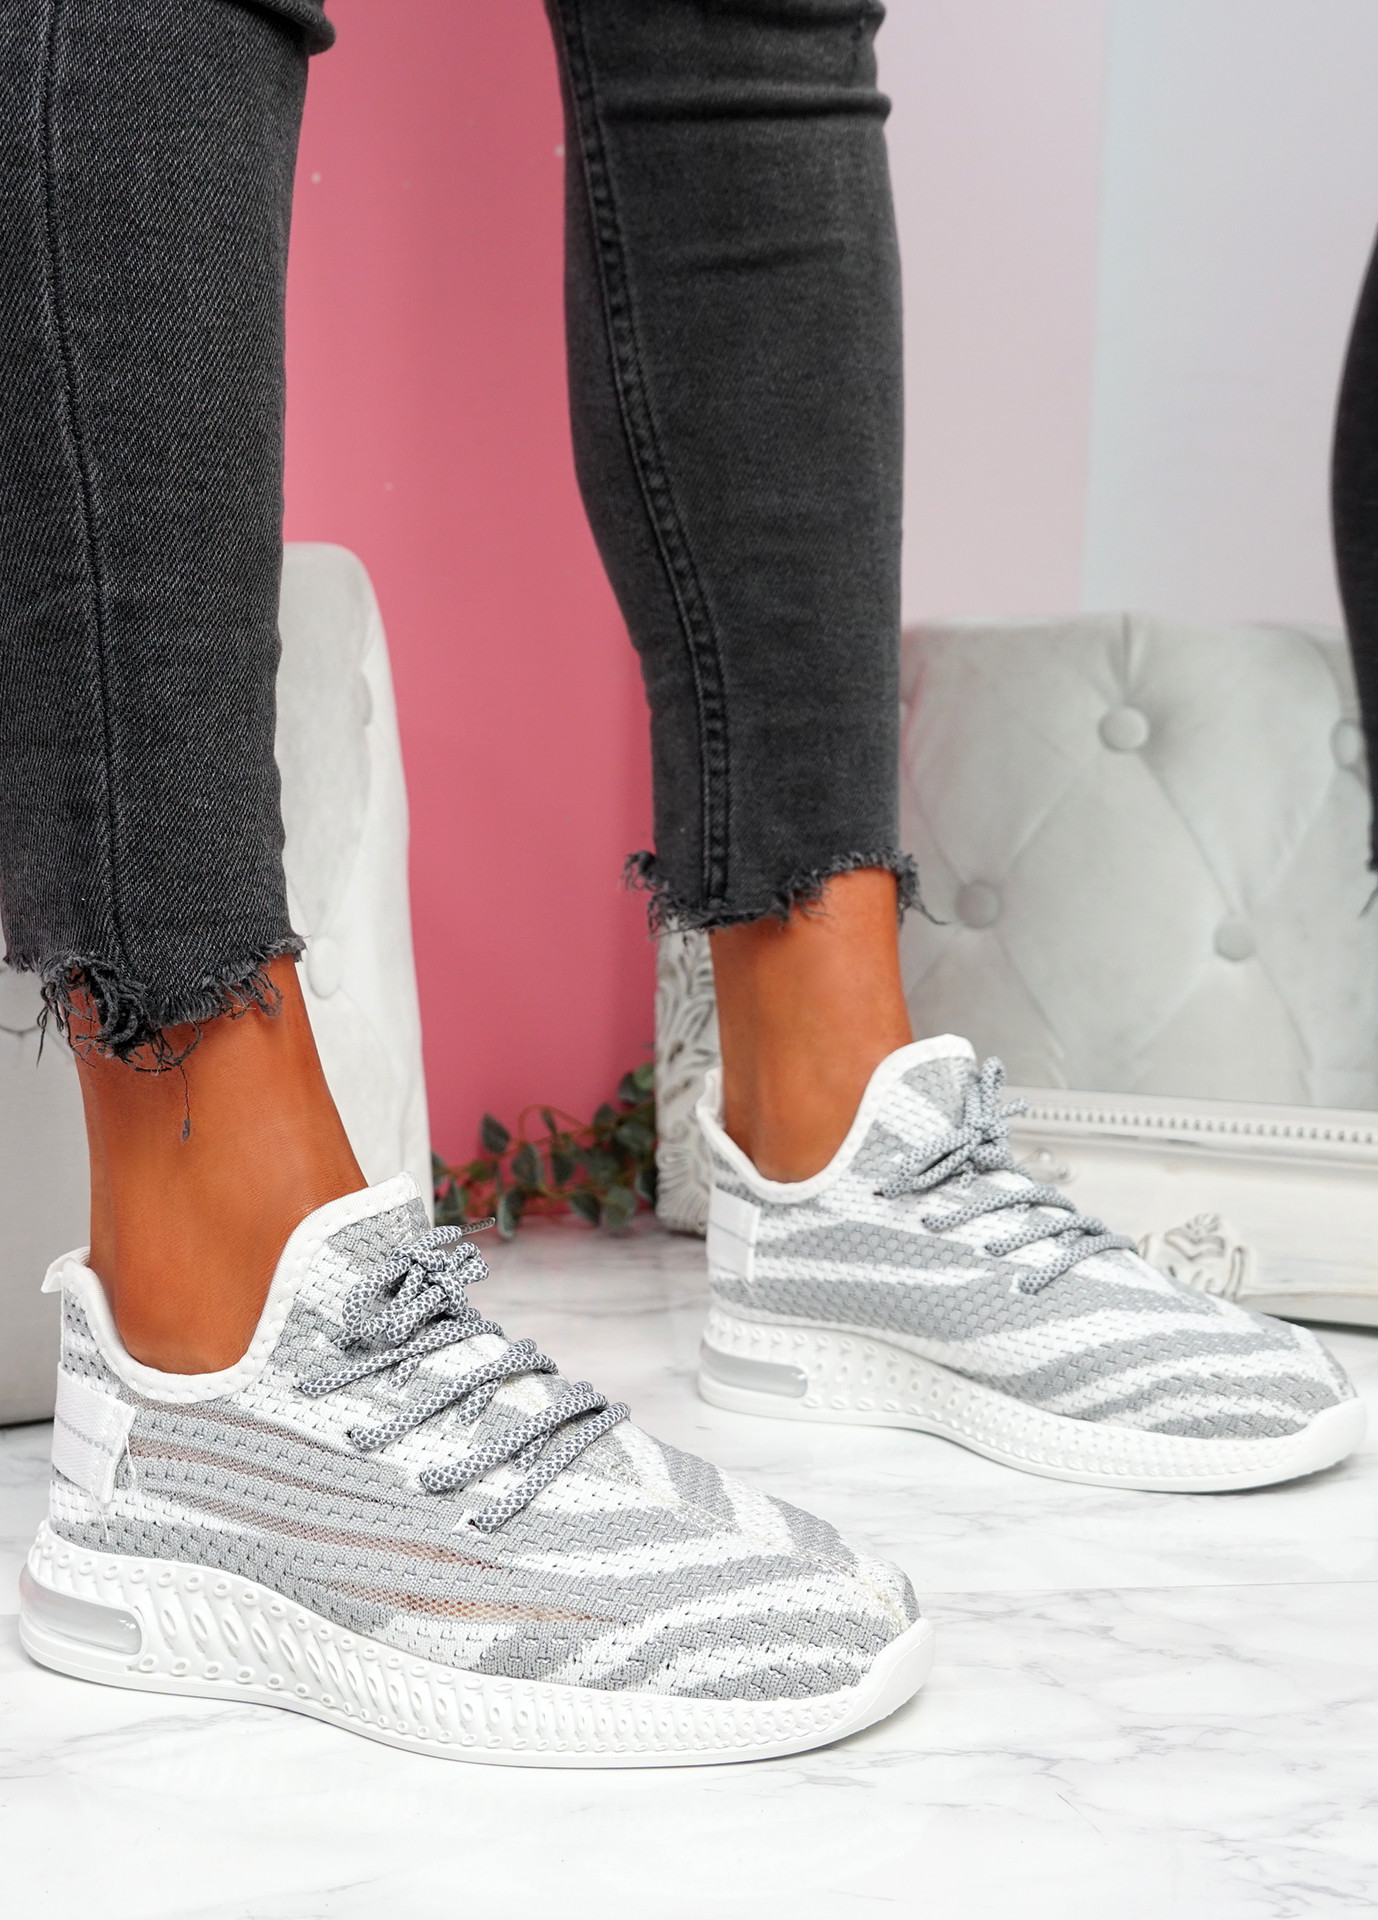 Paga Grey Knit Trainers